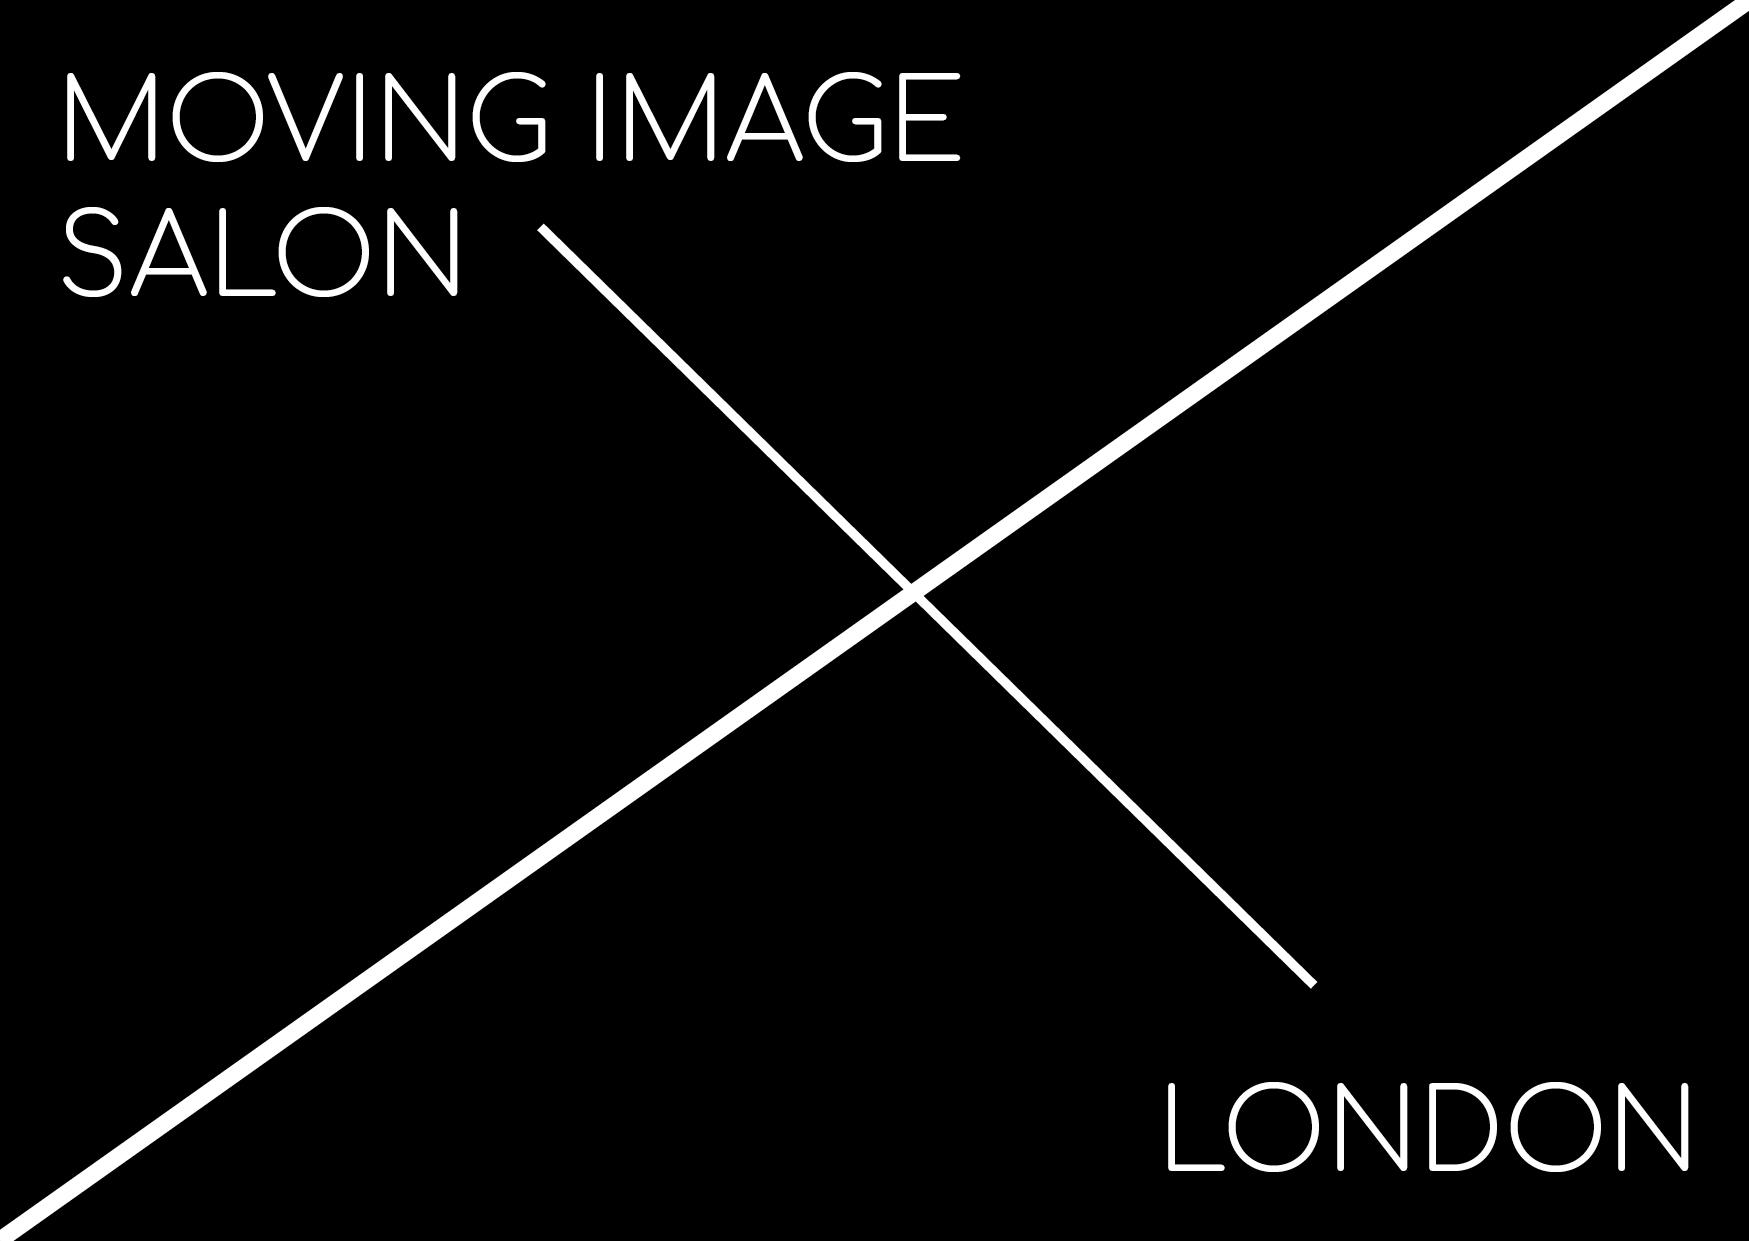 MOVING IMAGE SALON